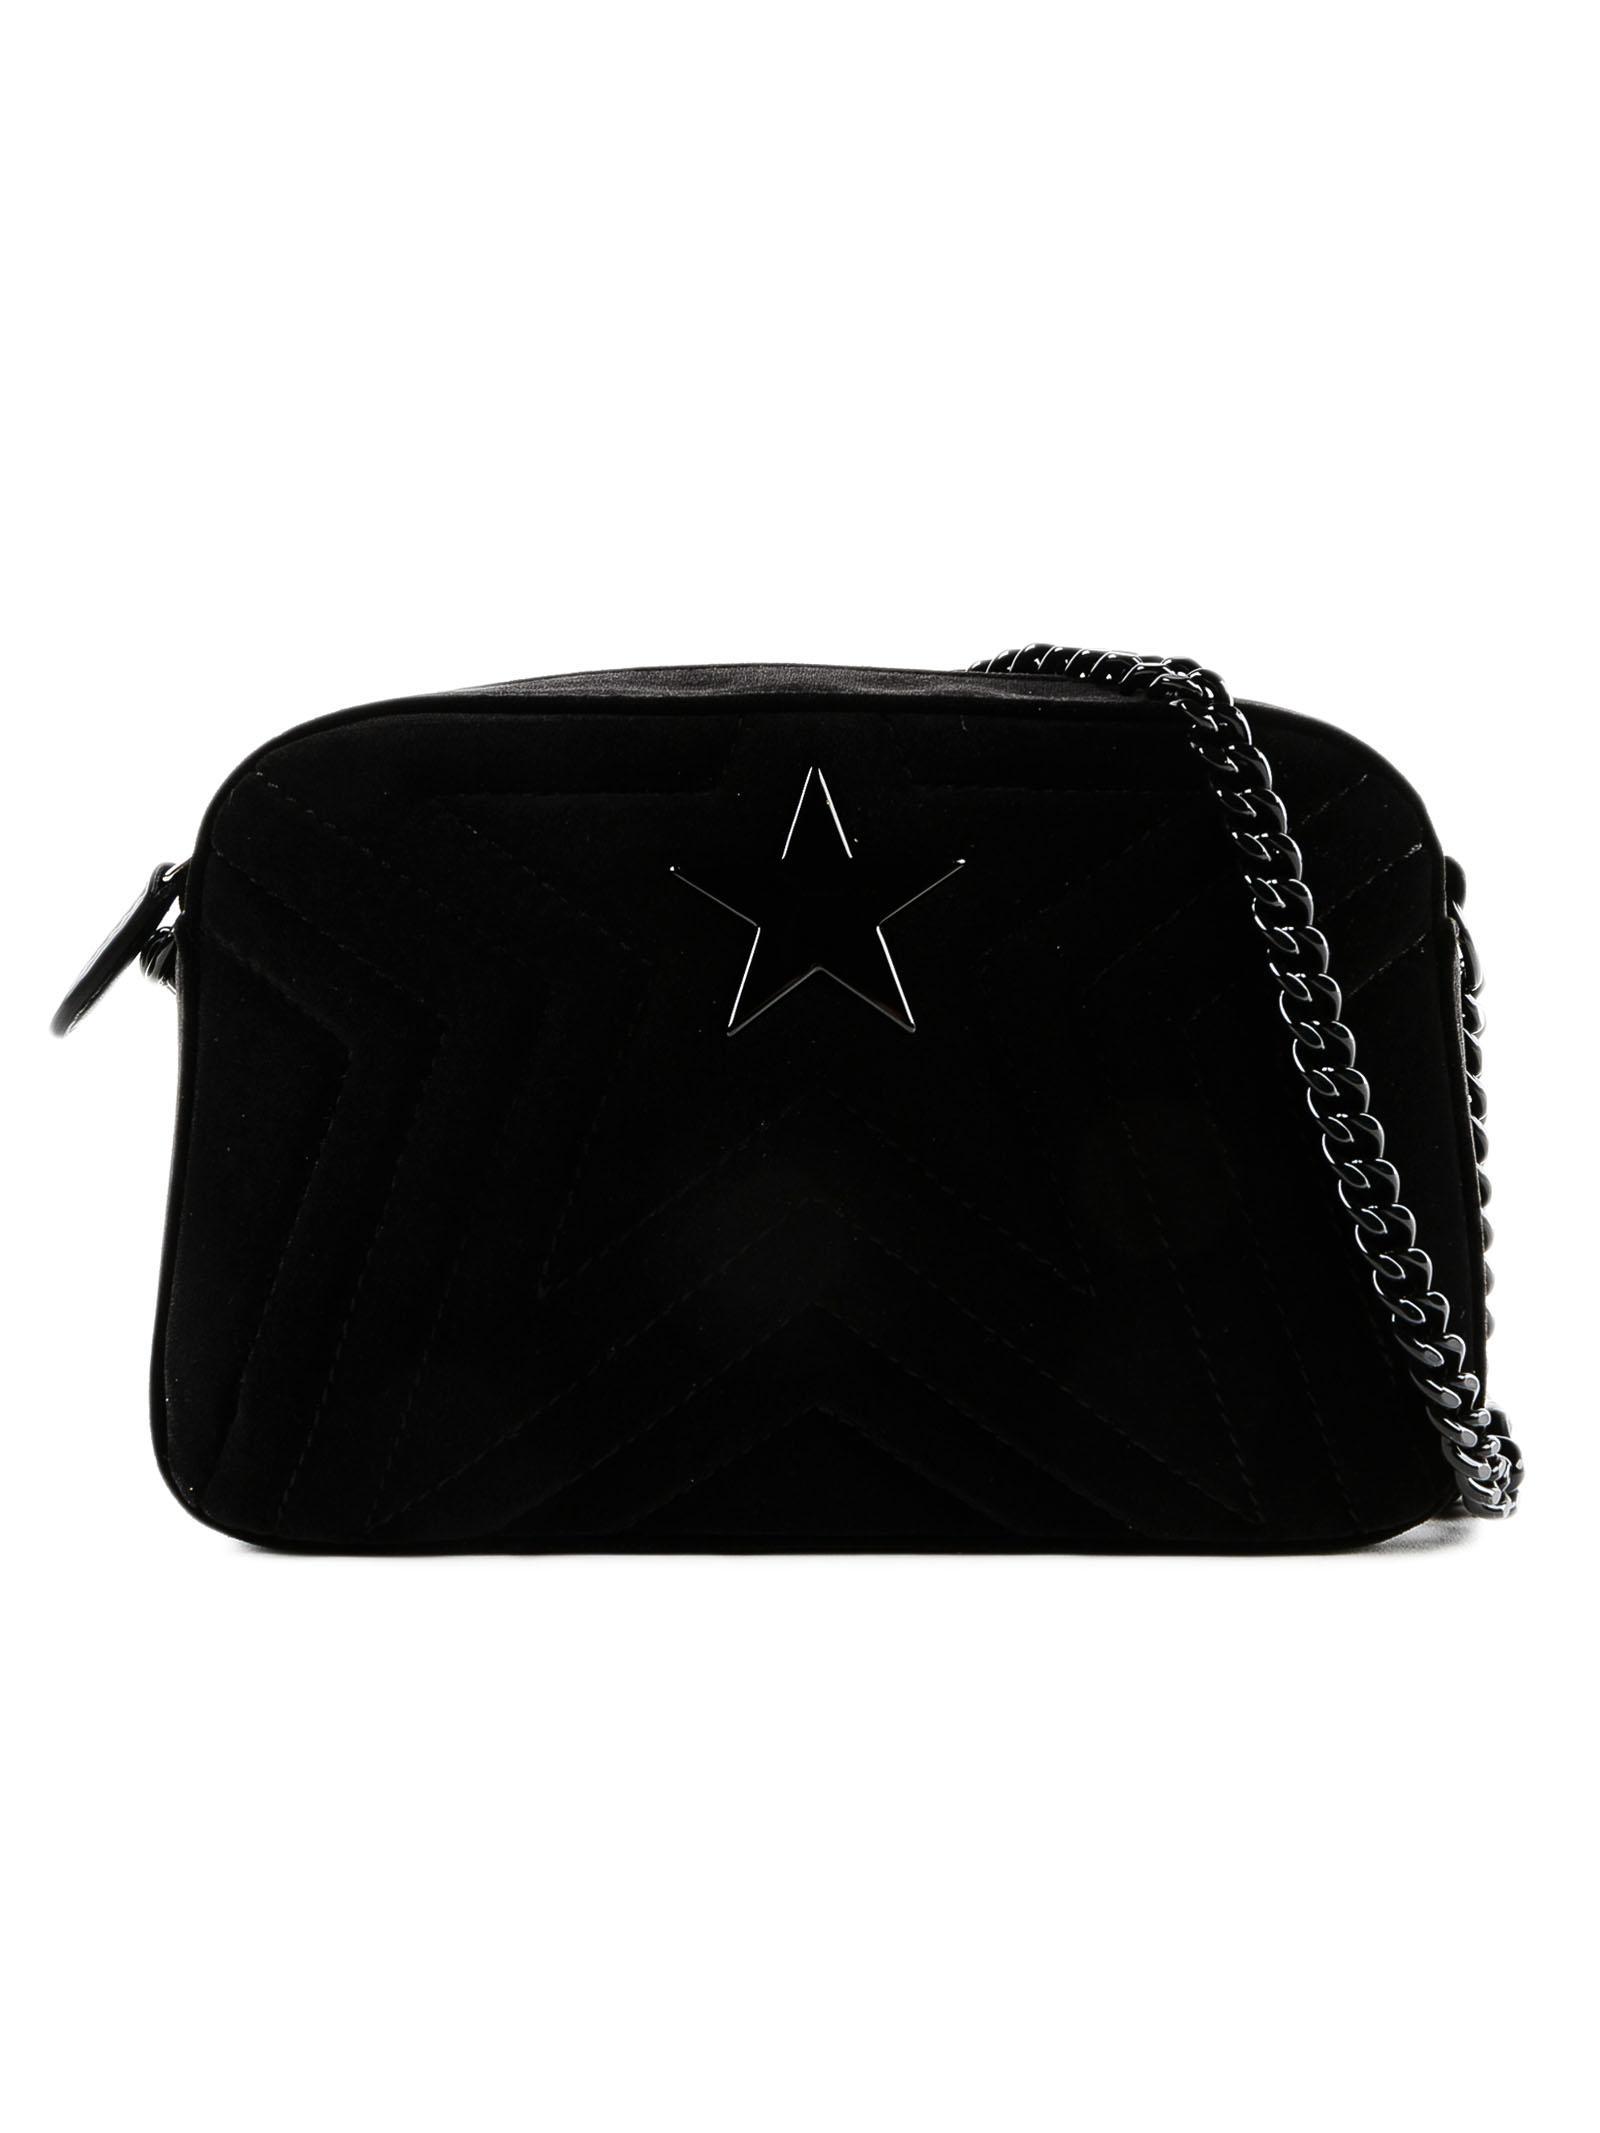 ff26ff8d28 Lyst - Stella McCartney Small Stella Star Velvet Bag in Black